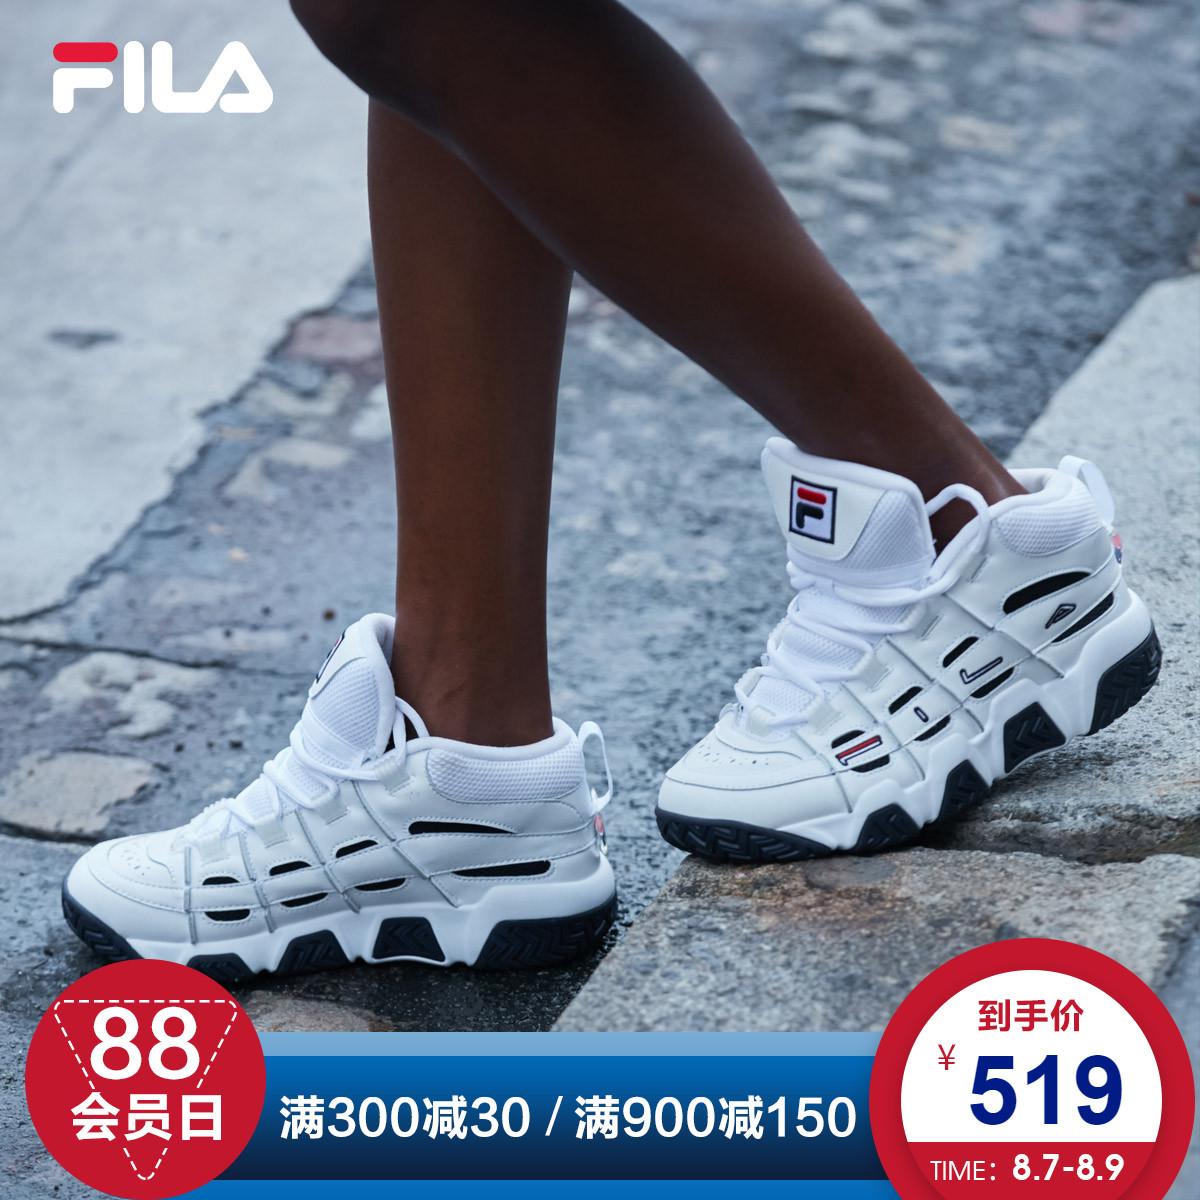 FILA斐乐女鞋明星同款Barricade运动休闲复古潮流篮球文化鞋女鞋